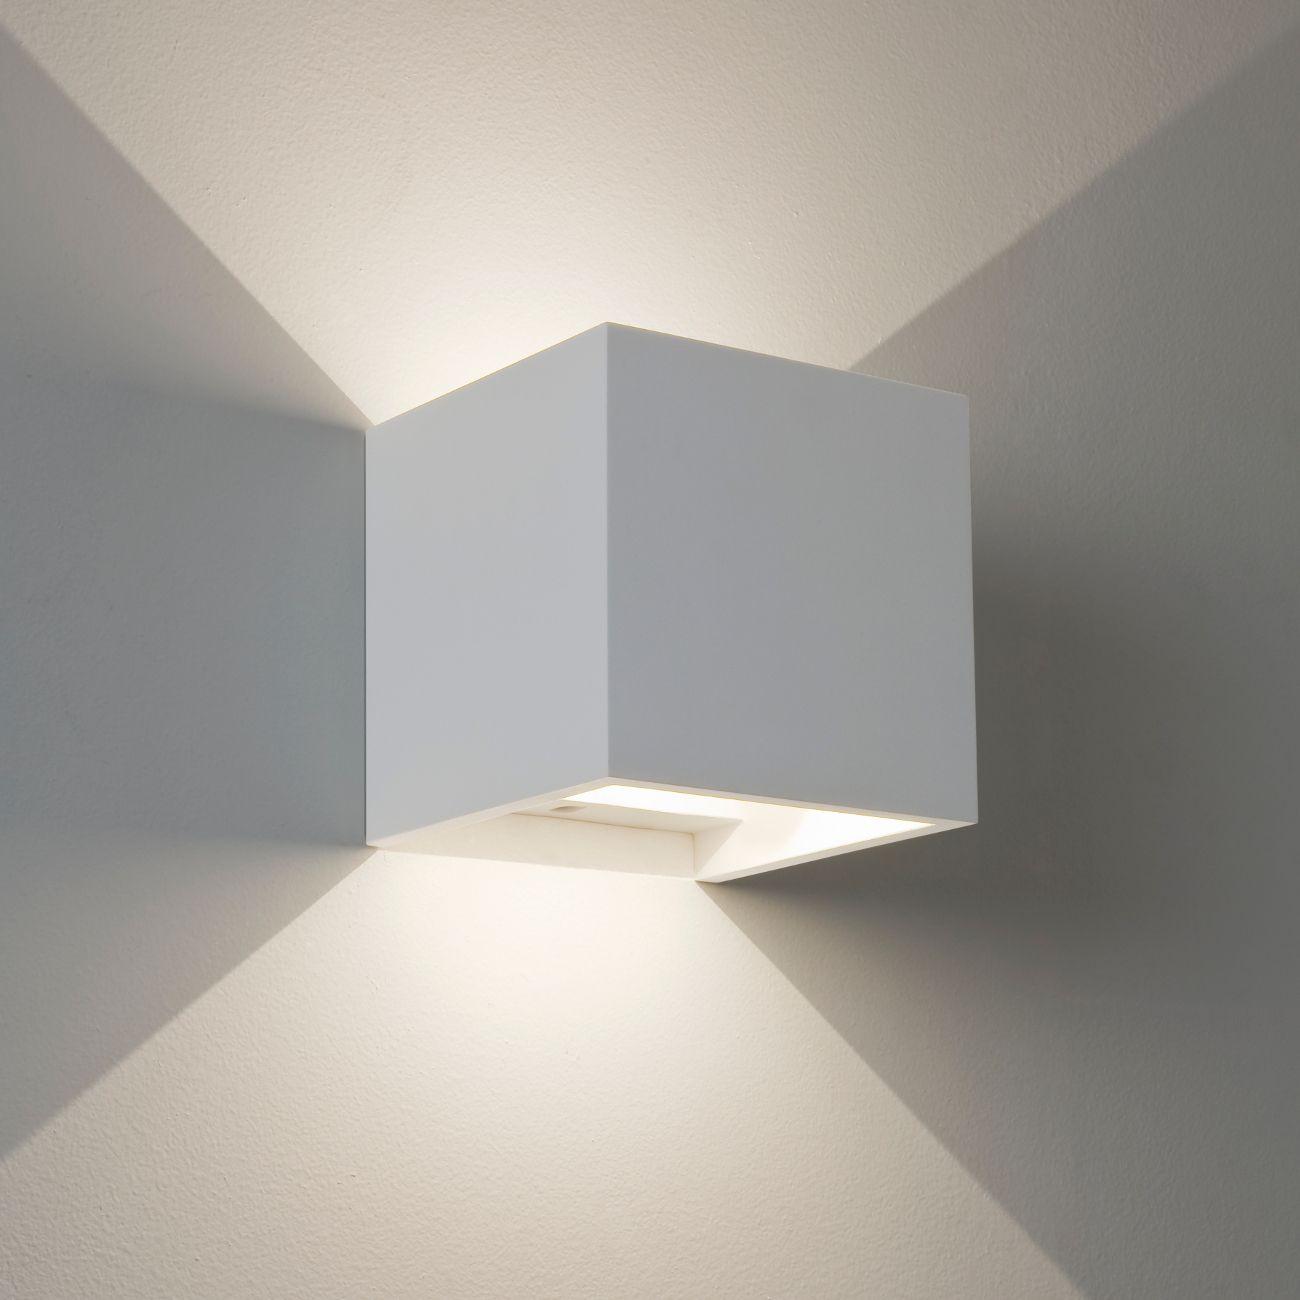 Wandleuchte in quaderform gips wei pienza led astro wei - Wandlampe indirekte beleuchtung ...